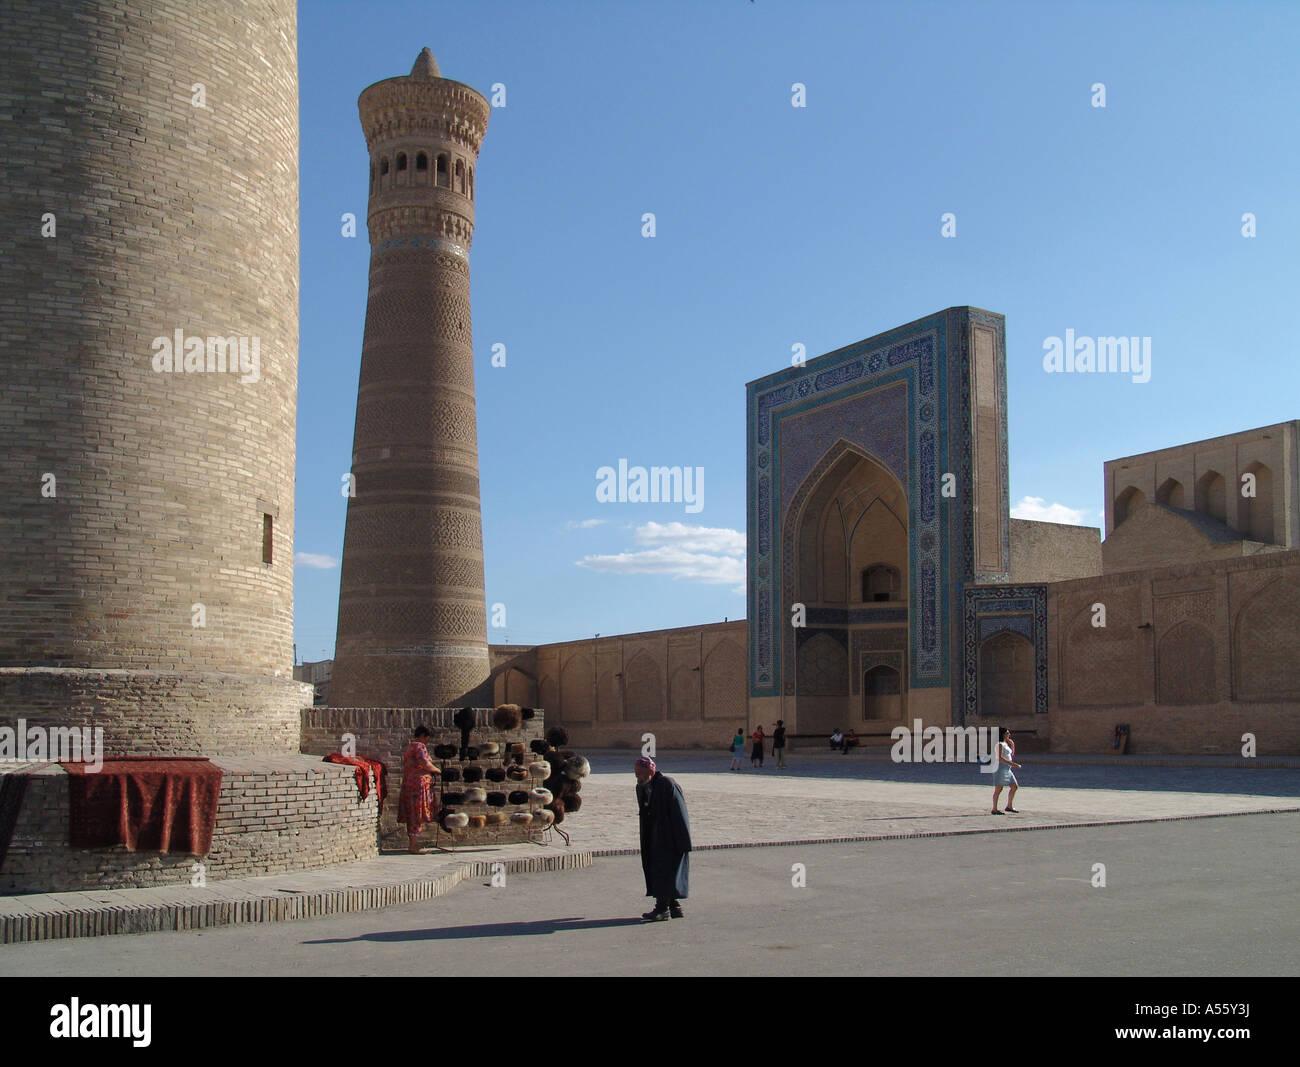 Painet iw2366 in Zentralasien Sowjetunion Bilder Islam moslem Seiden Straße Usbekistan Kalon Minarett Moschee Stockbild